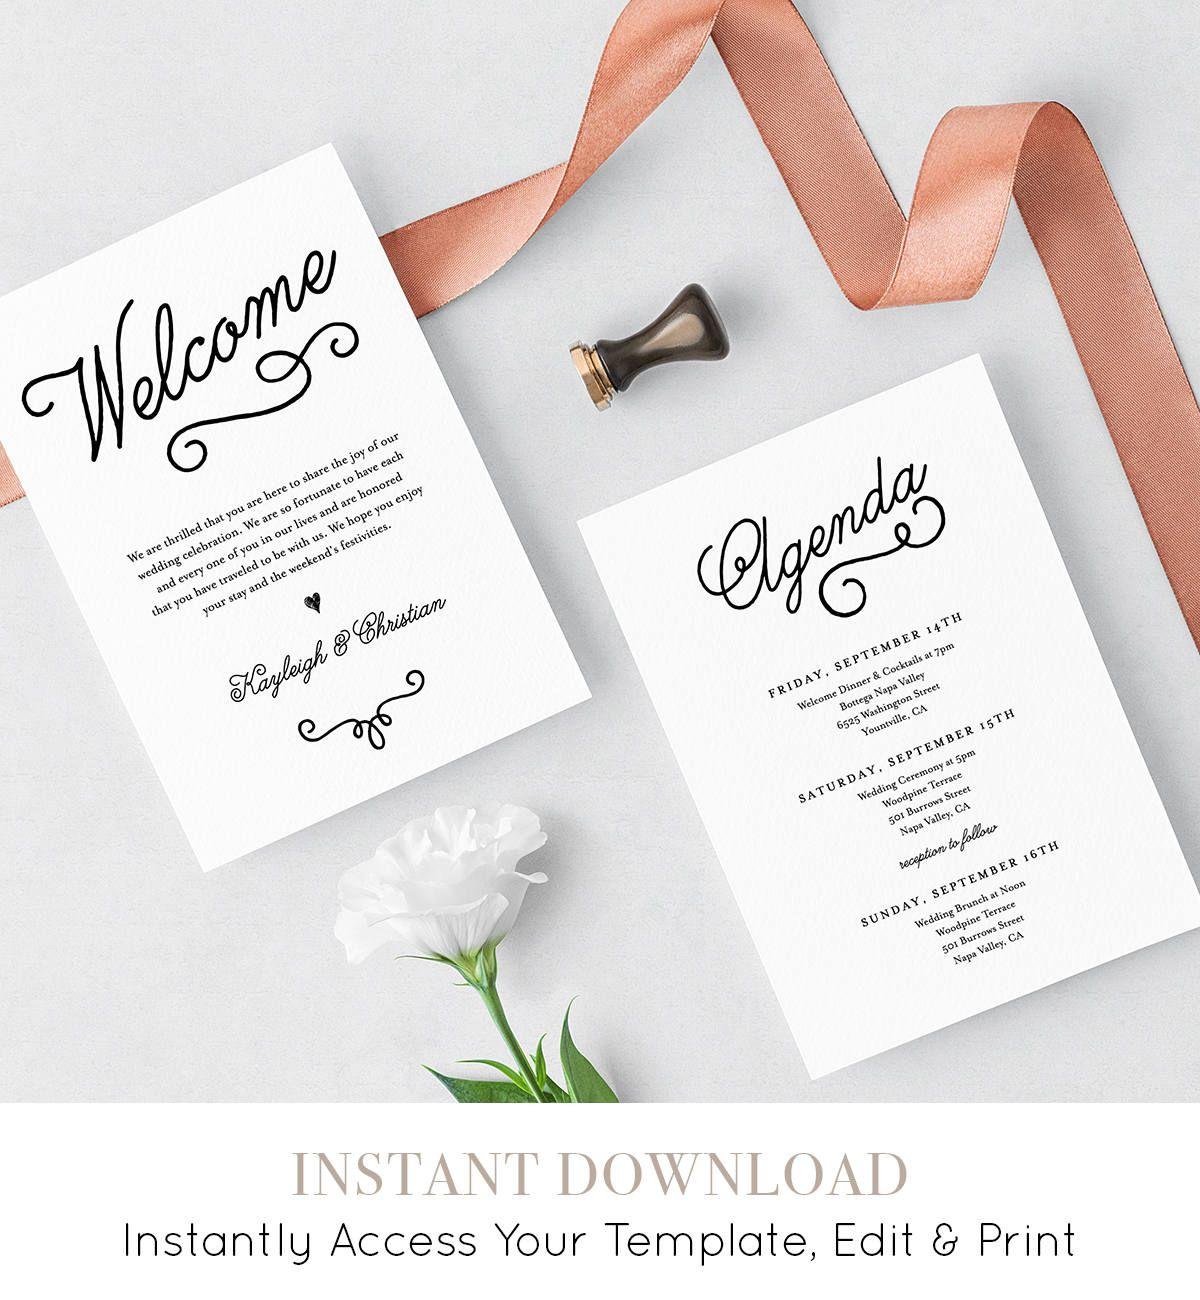 008 Sensational Wedding Welcome Bag Letter Template Free Highest Quality Full